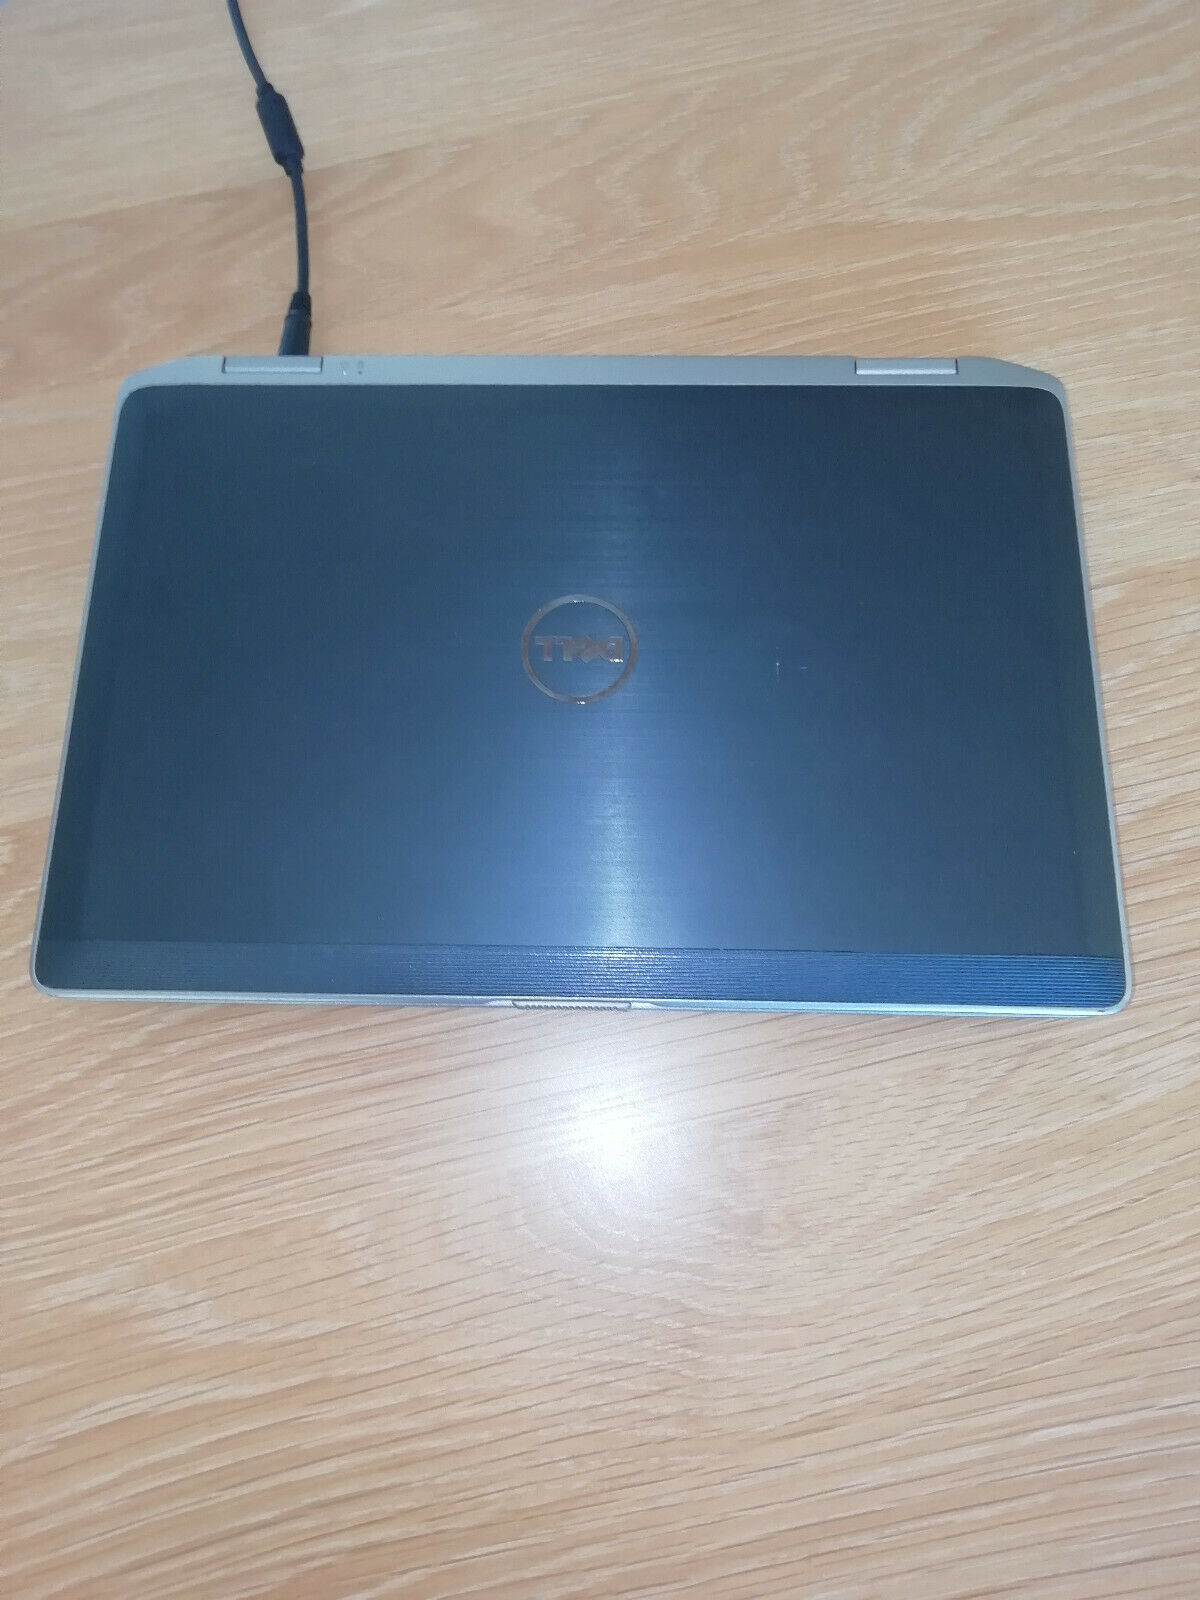 Laptop Windows - Dell 14 inch Latitude Laptop - E6420 64bit Windows 10 ver.1909. 250Gb HD 4Gb RAM